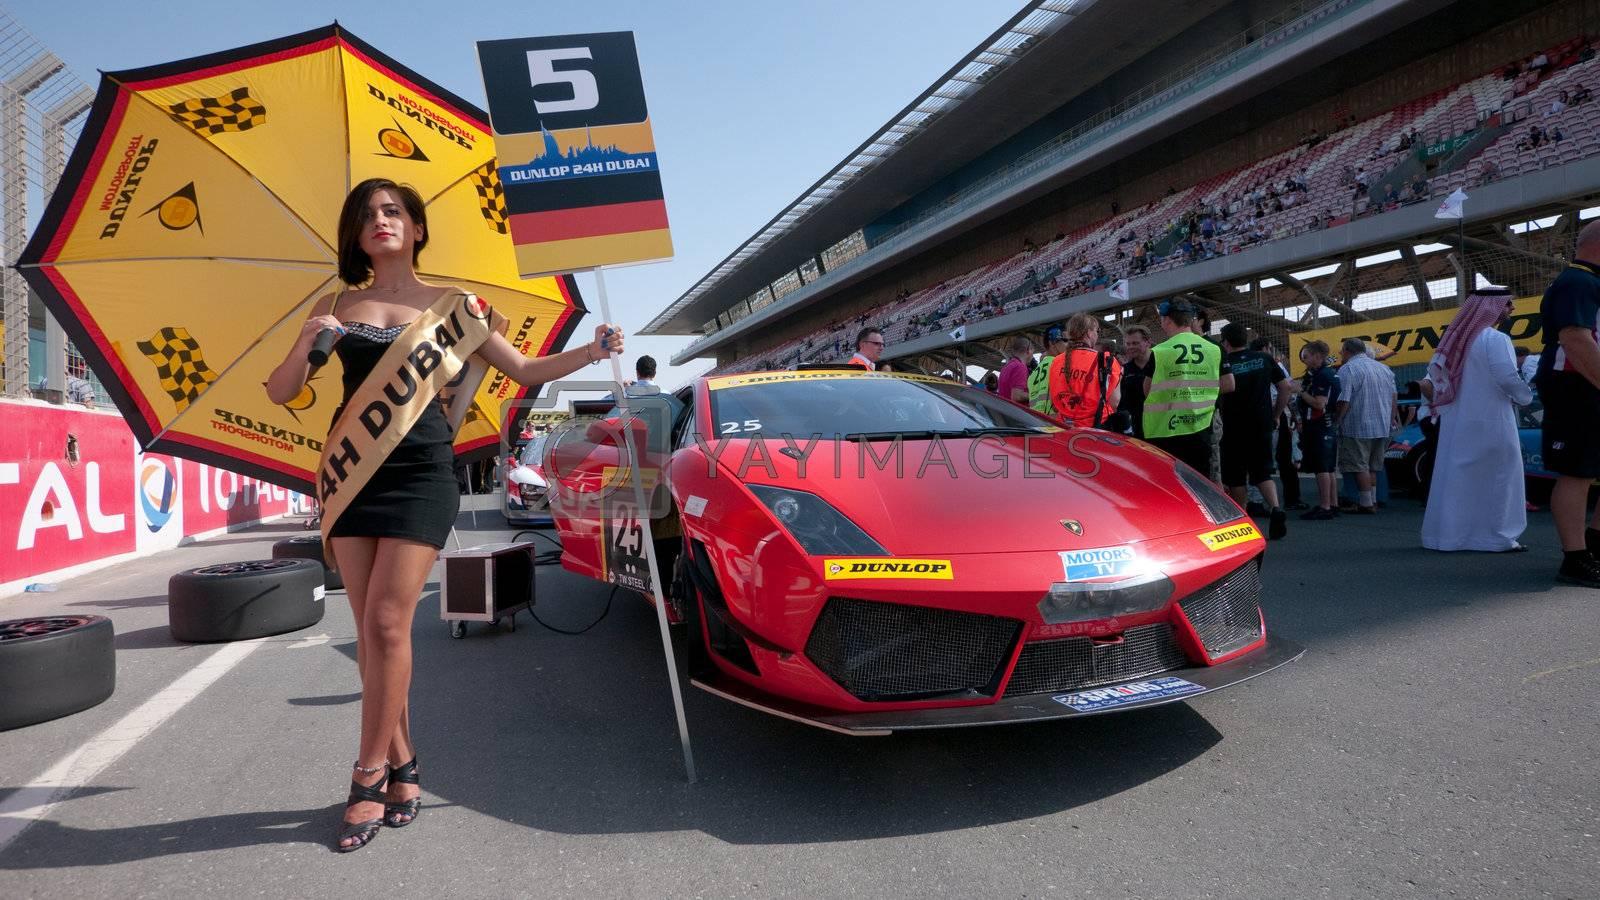 DUBAI - JANUARY 13: Umbrella girl and Lamborghini Gallardo LP600 at the start grid before the 2012 Dunlop 24 Hour Race at Dubai Autodrome on January 13, 2012.